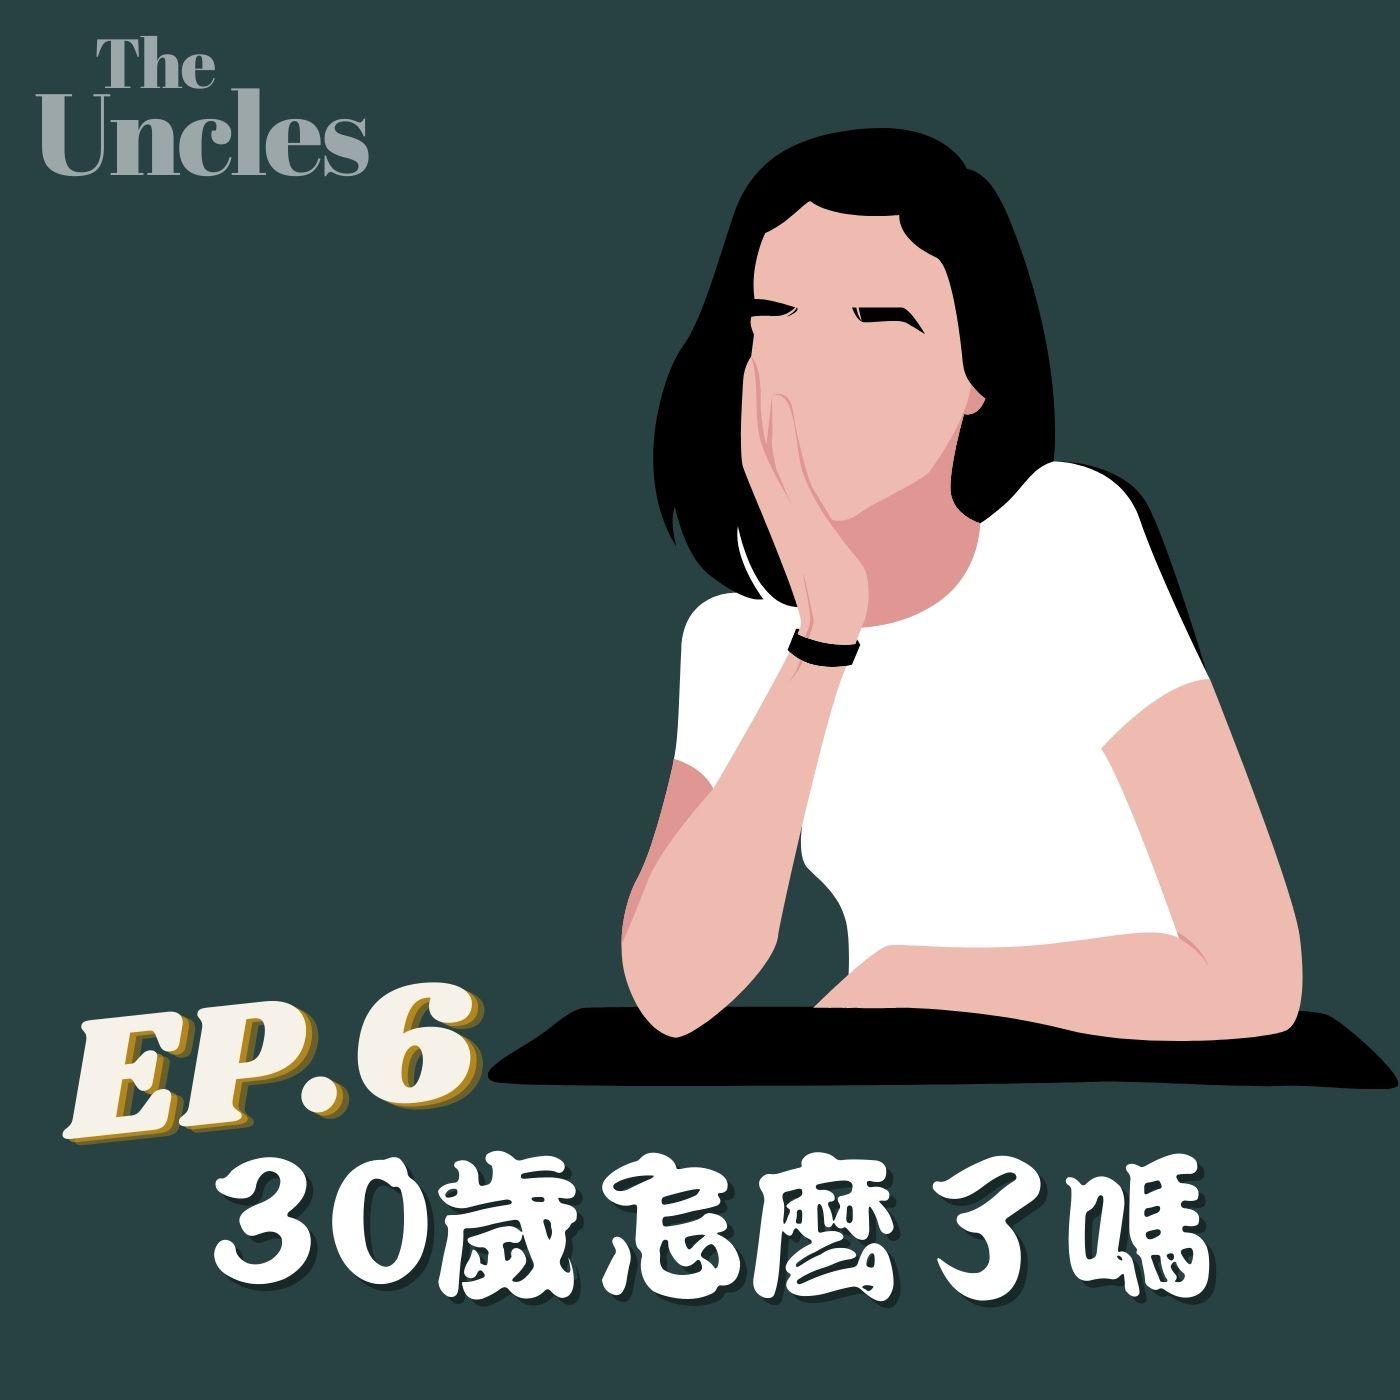 EP6. [聊生活] 30歲怎麼了嗎?